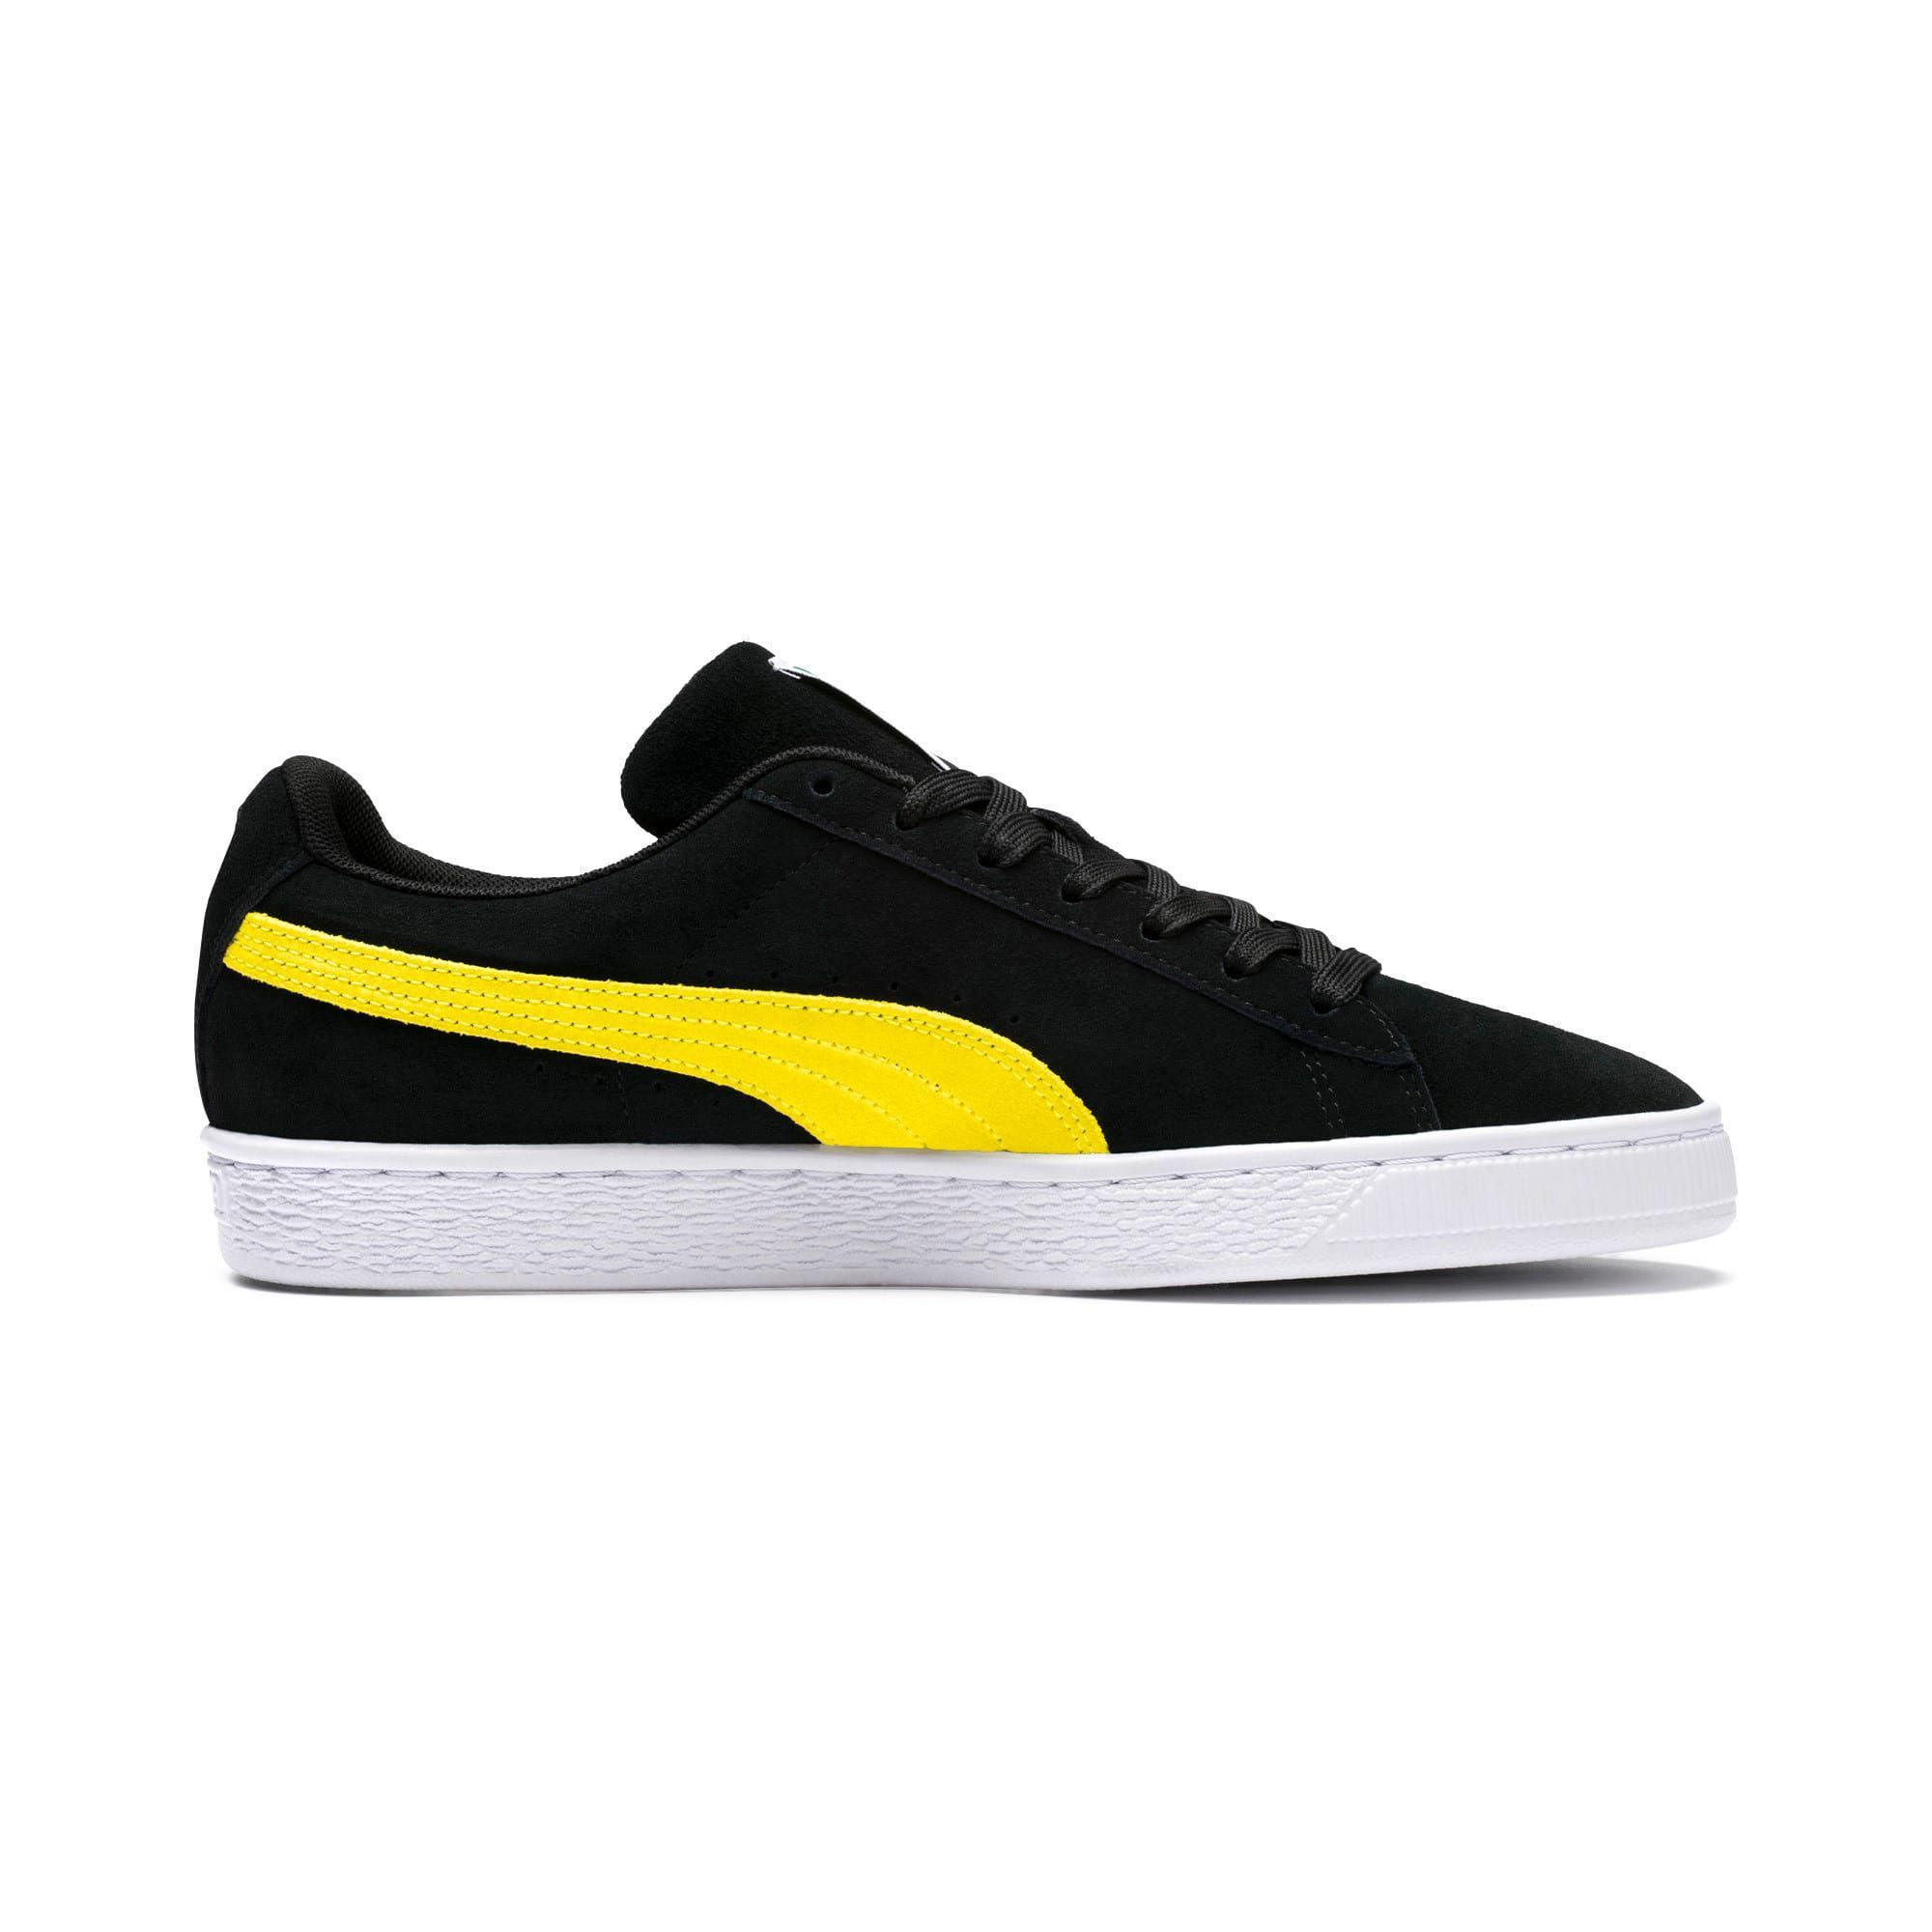 puma suede jaune et noir